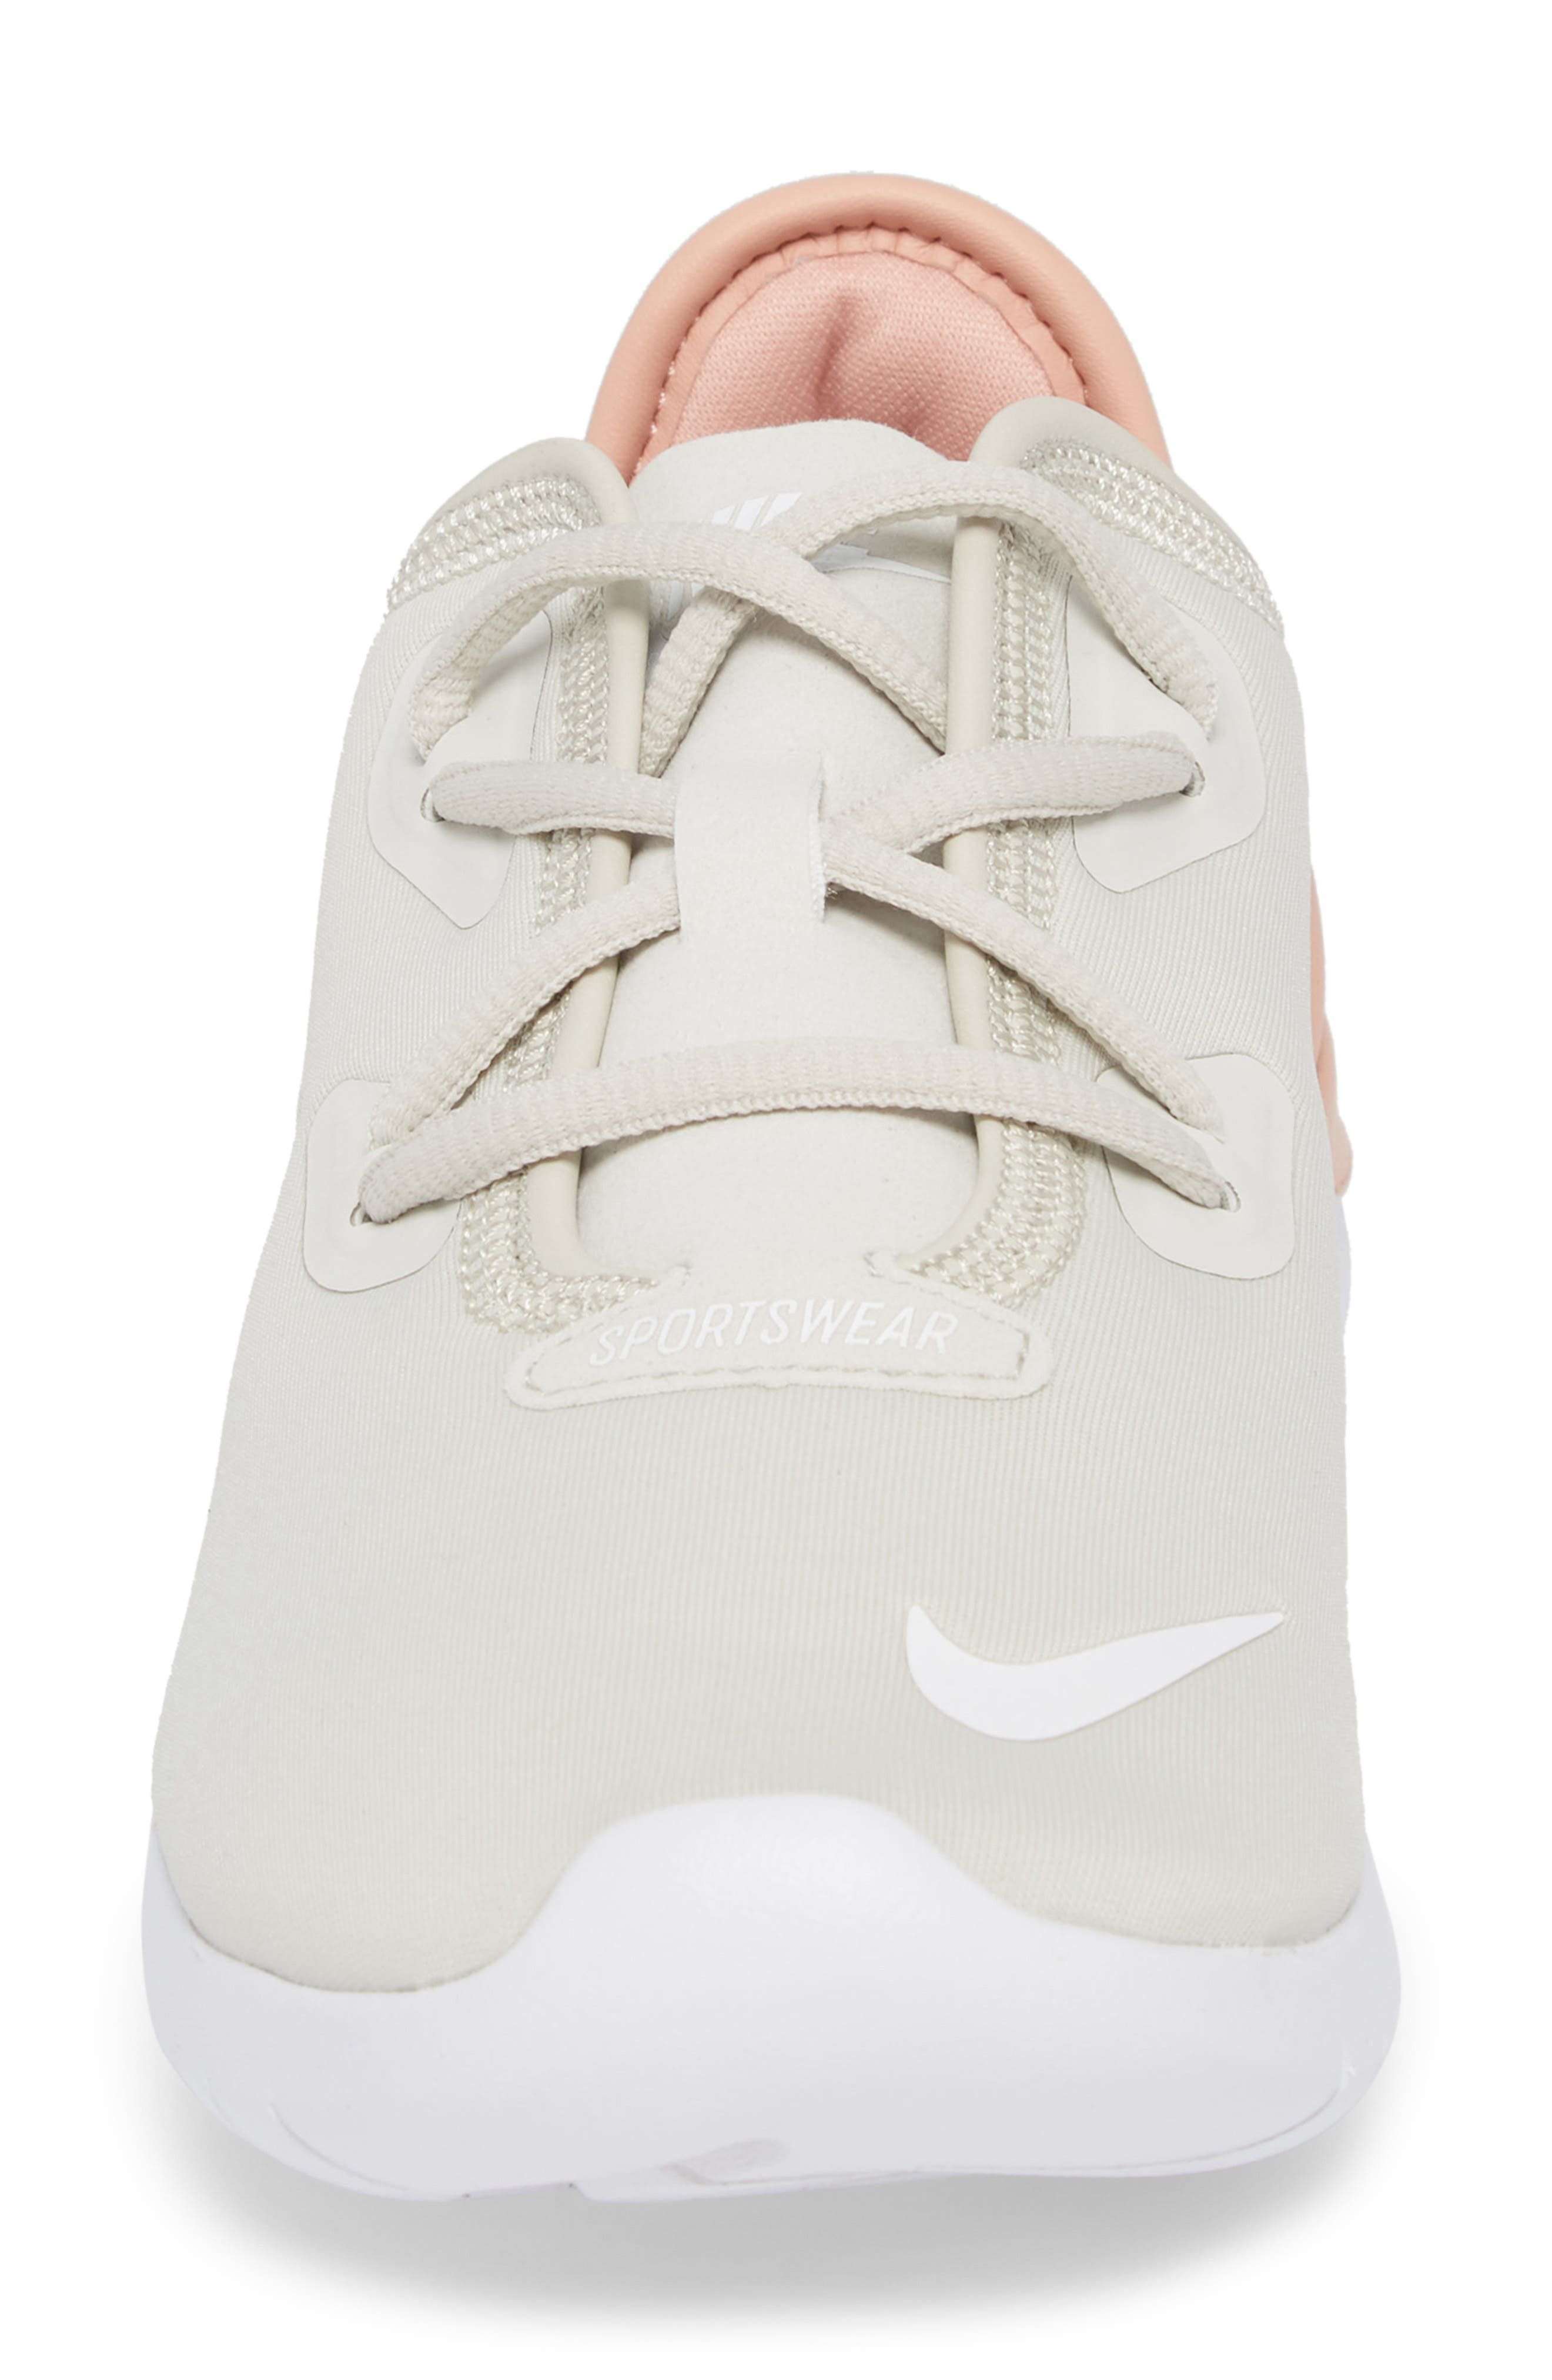 Hakata Sneaker,                             Alternate thumbnail 4, color,                             Light Bone/ White/ Coral